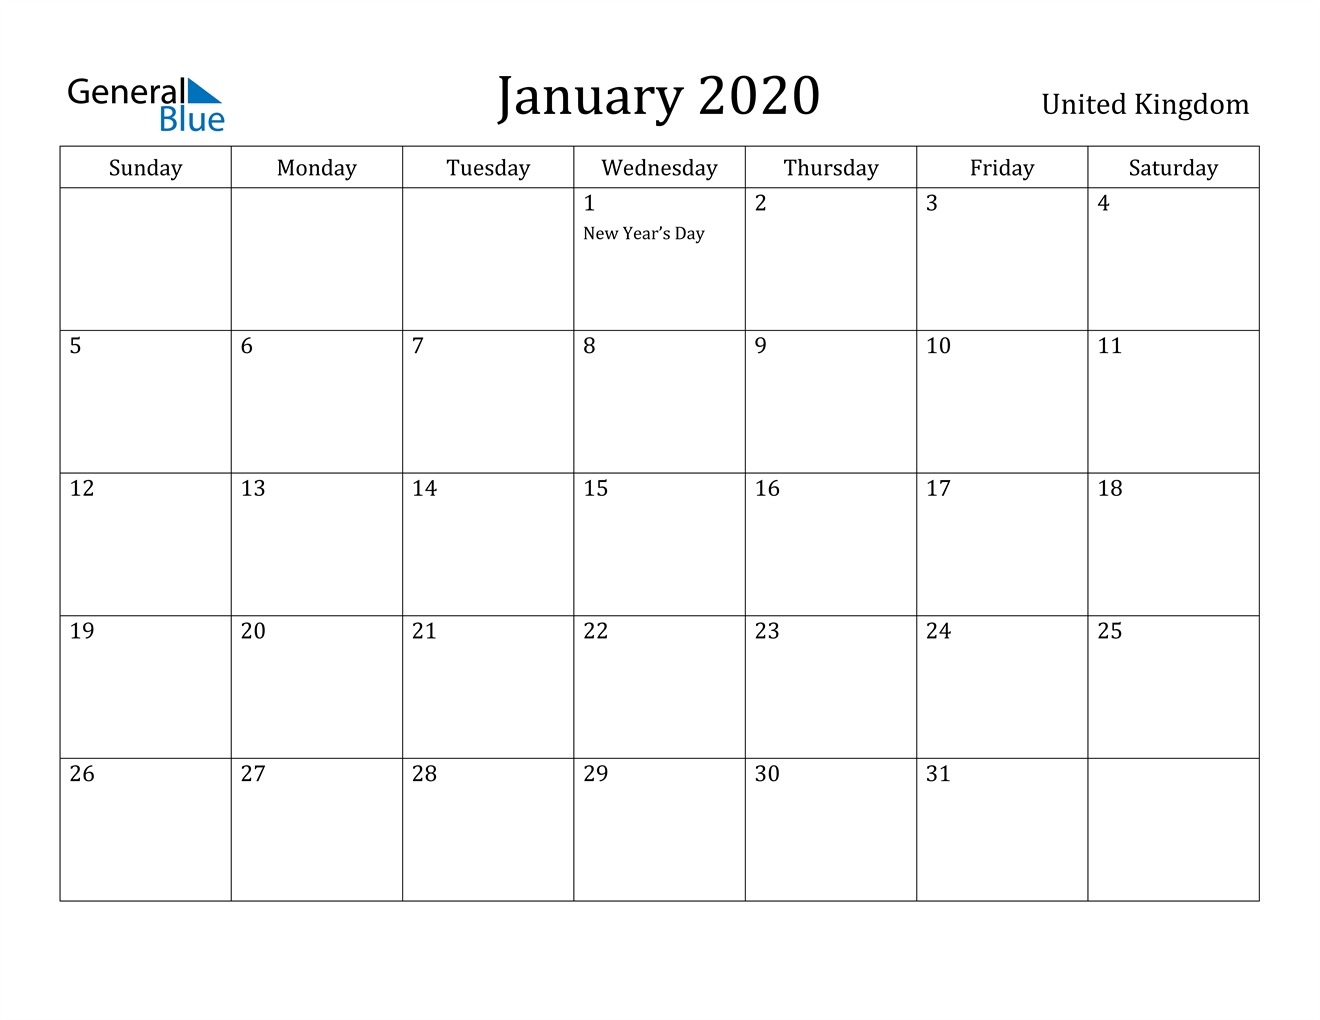 January 2020 Calendar - United Kingdom-2020 Uk Monthly Calendar Uk